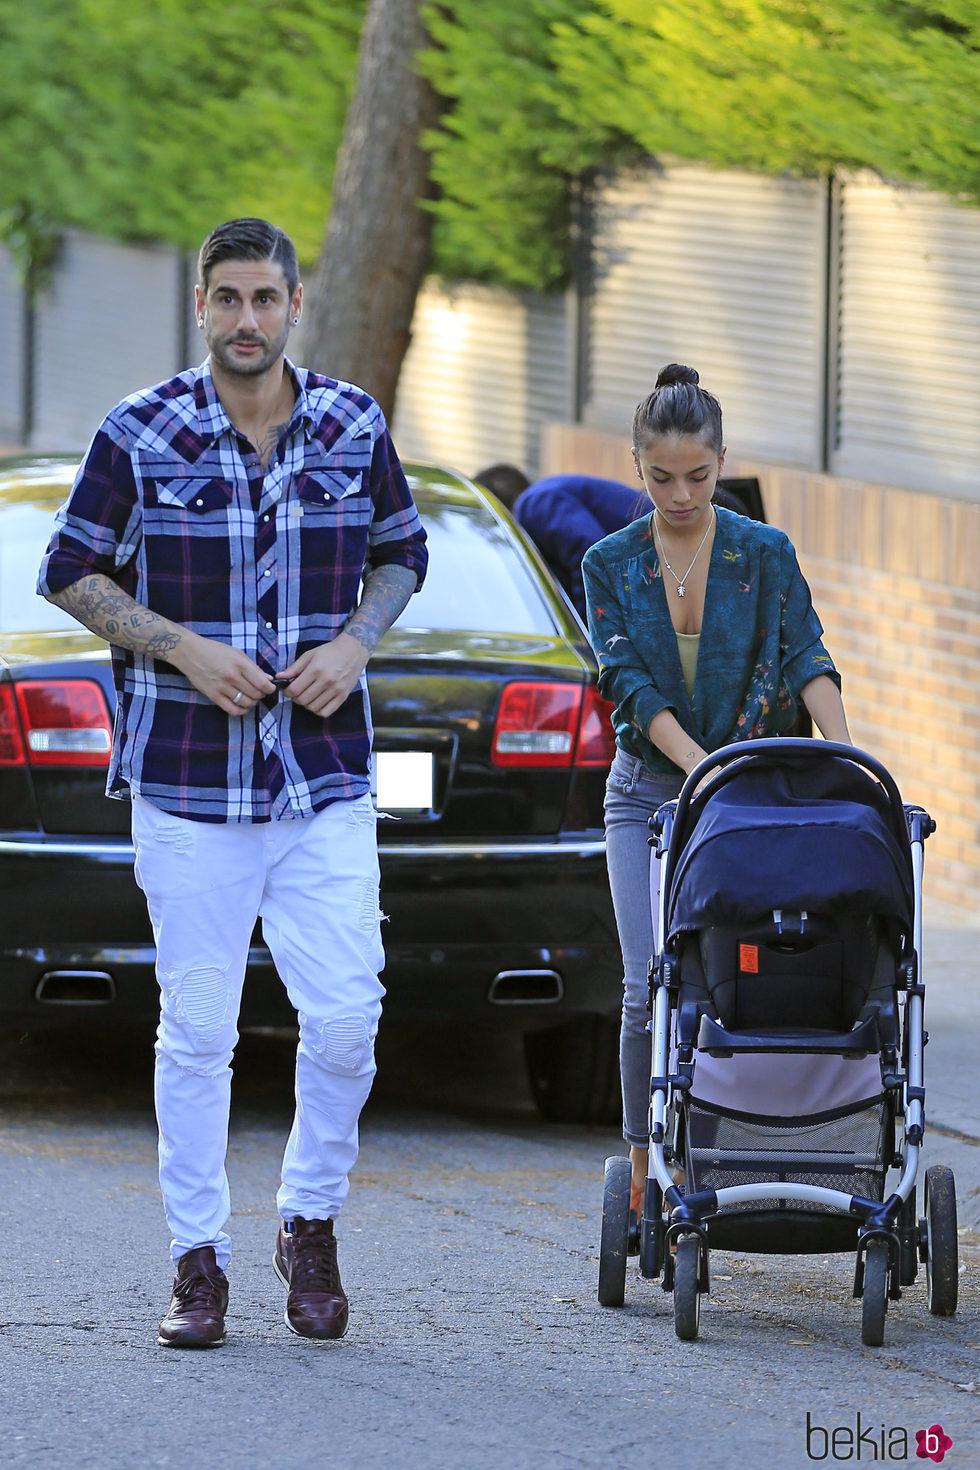 Melendi con Julia Nakamatsu y su hija Lola dando un paseo